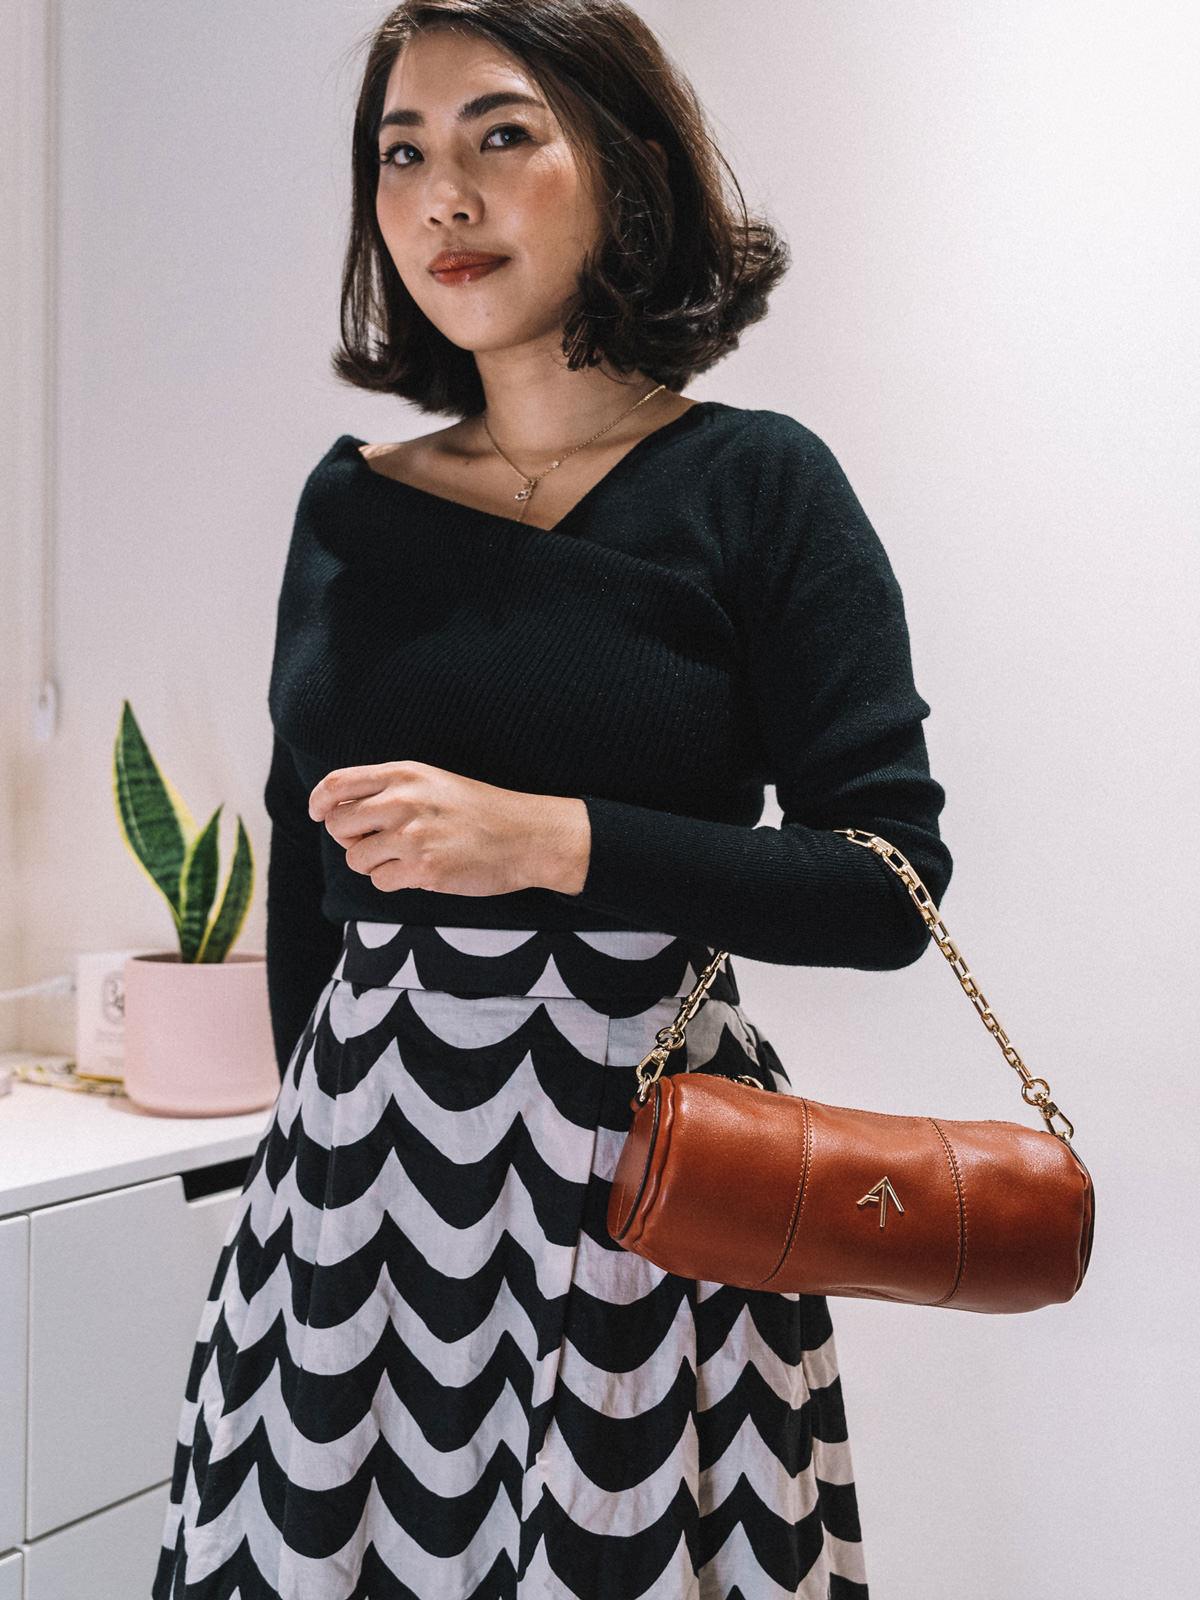 【Outfit】秋冬穿搭來了!Line & Dot不對稱針織上衣+Uniqlo x MARIMEKKO寬襬裙+Manu Atelier Mini Cylinder bag